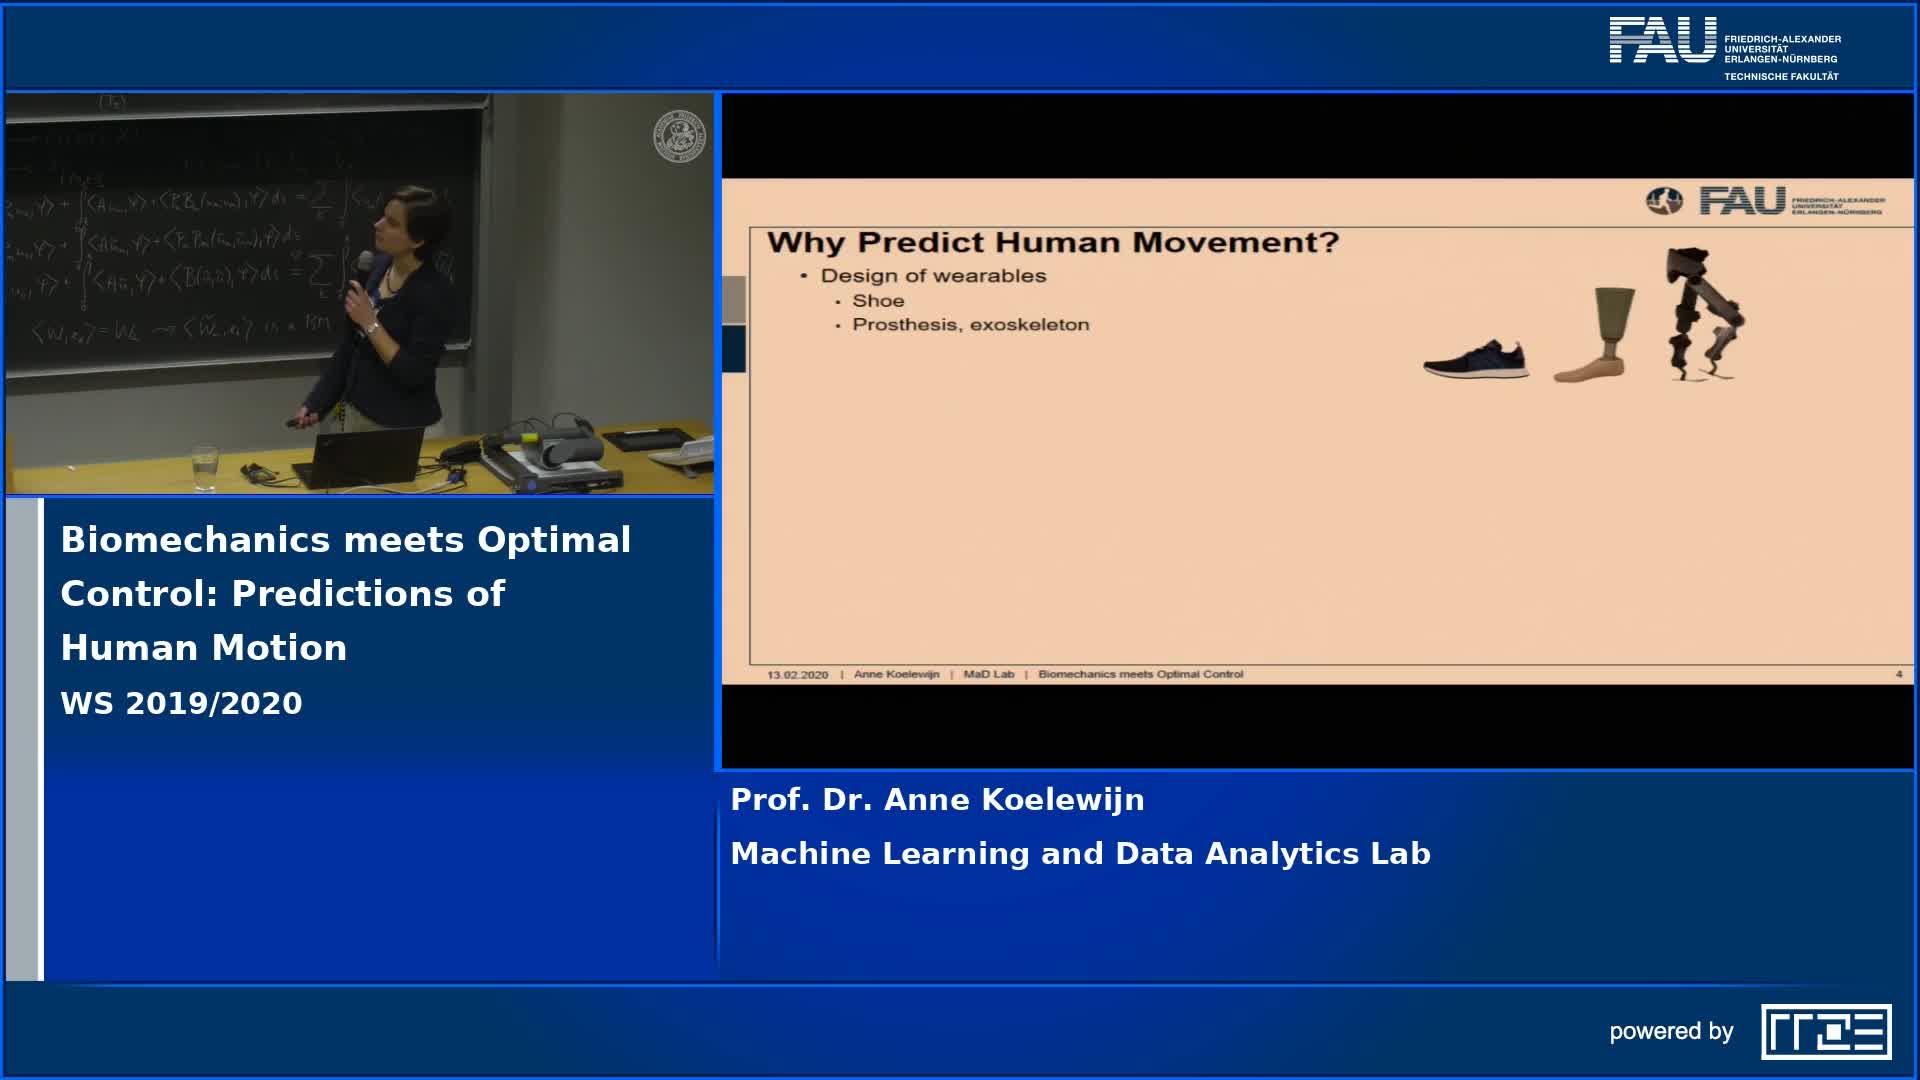 Biomechanics meets Optimal Control: Predictions of Human Motion preview image